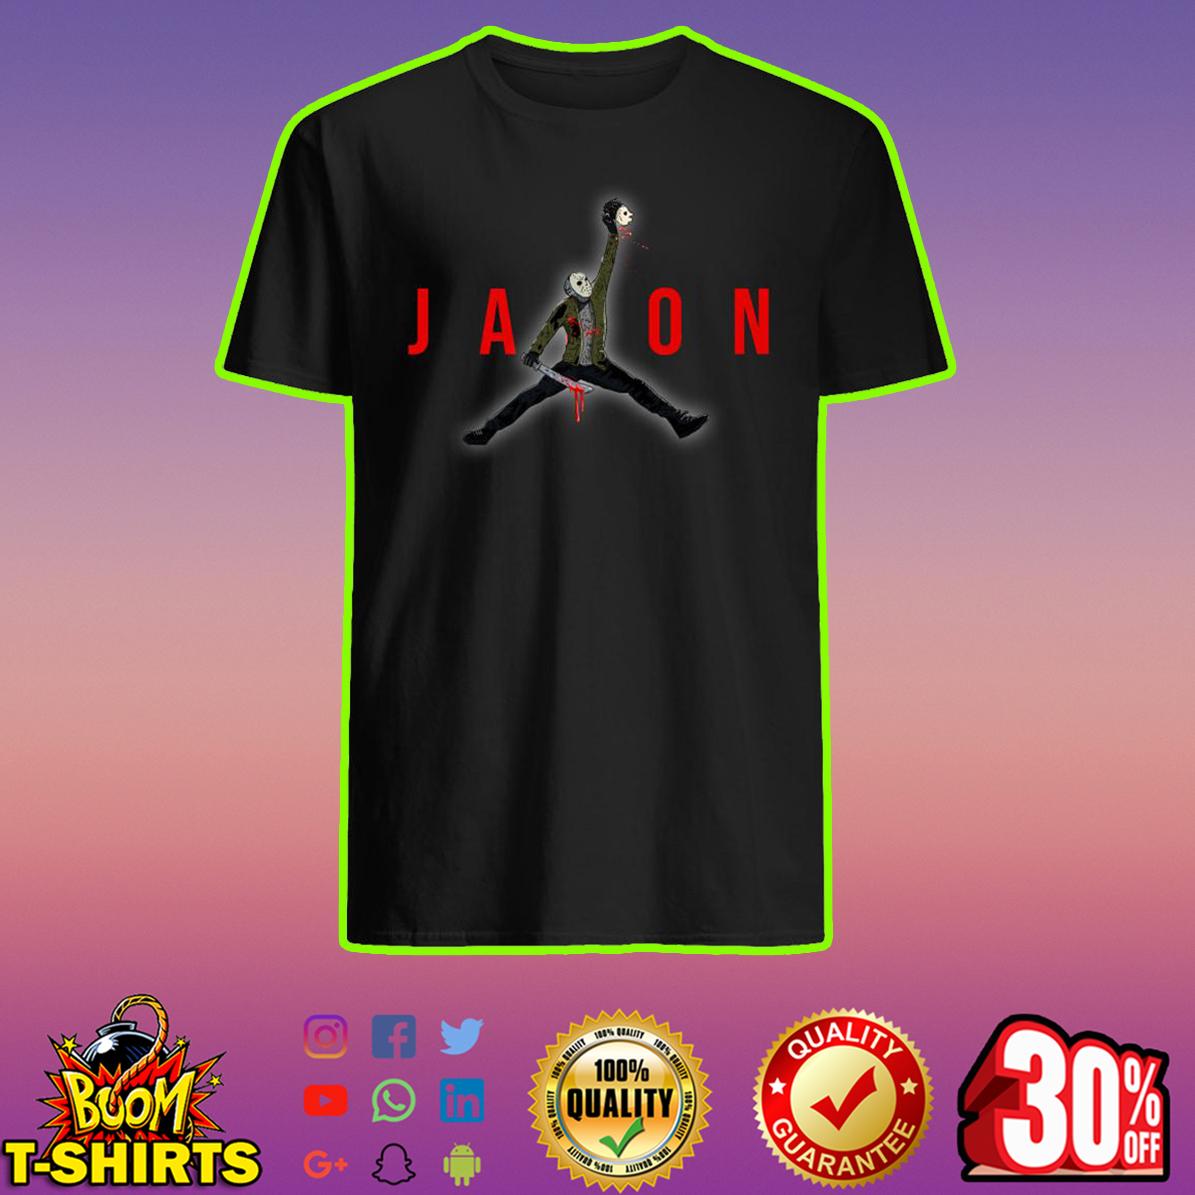 Jason Voorhees Jumpman Air Jordan shirt